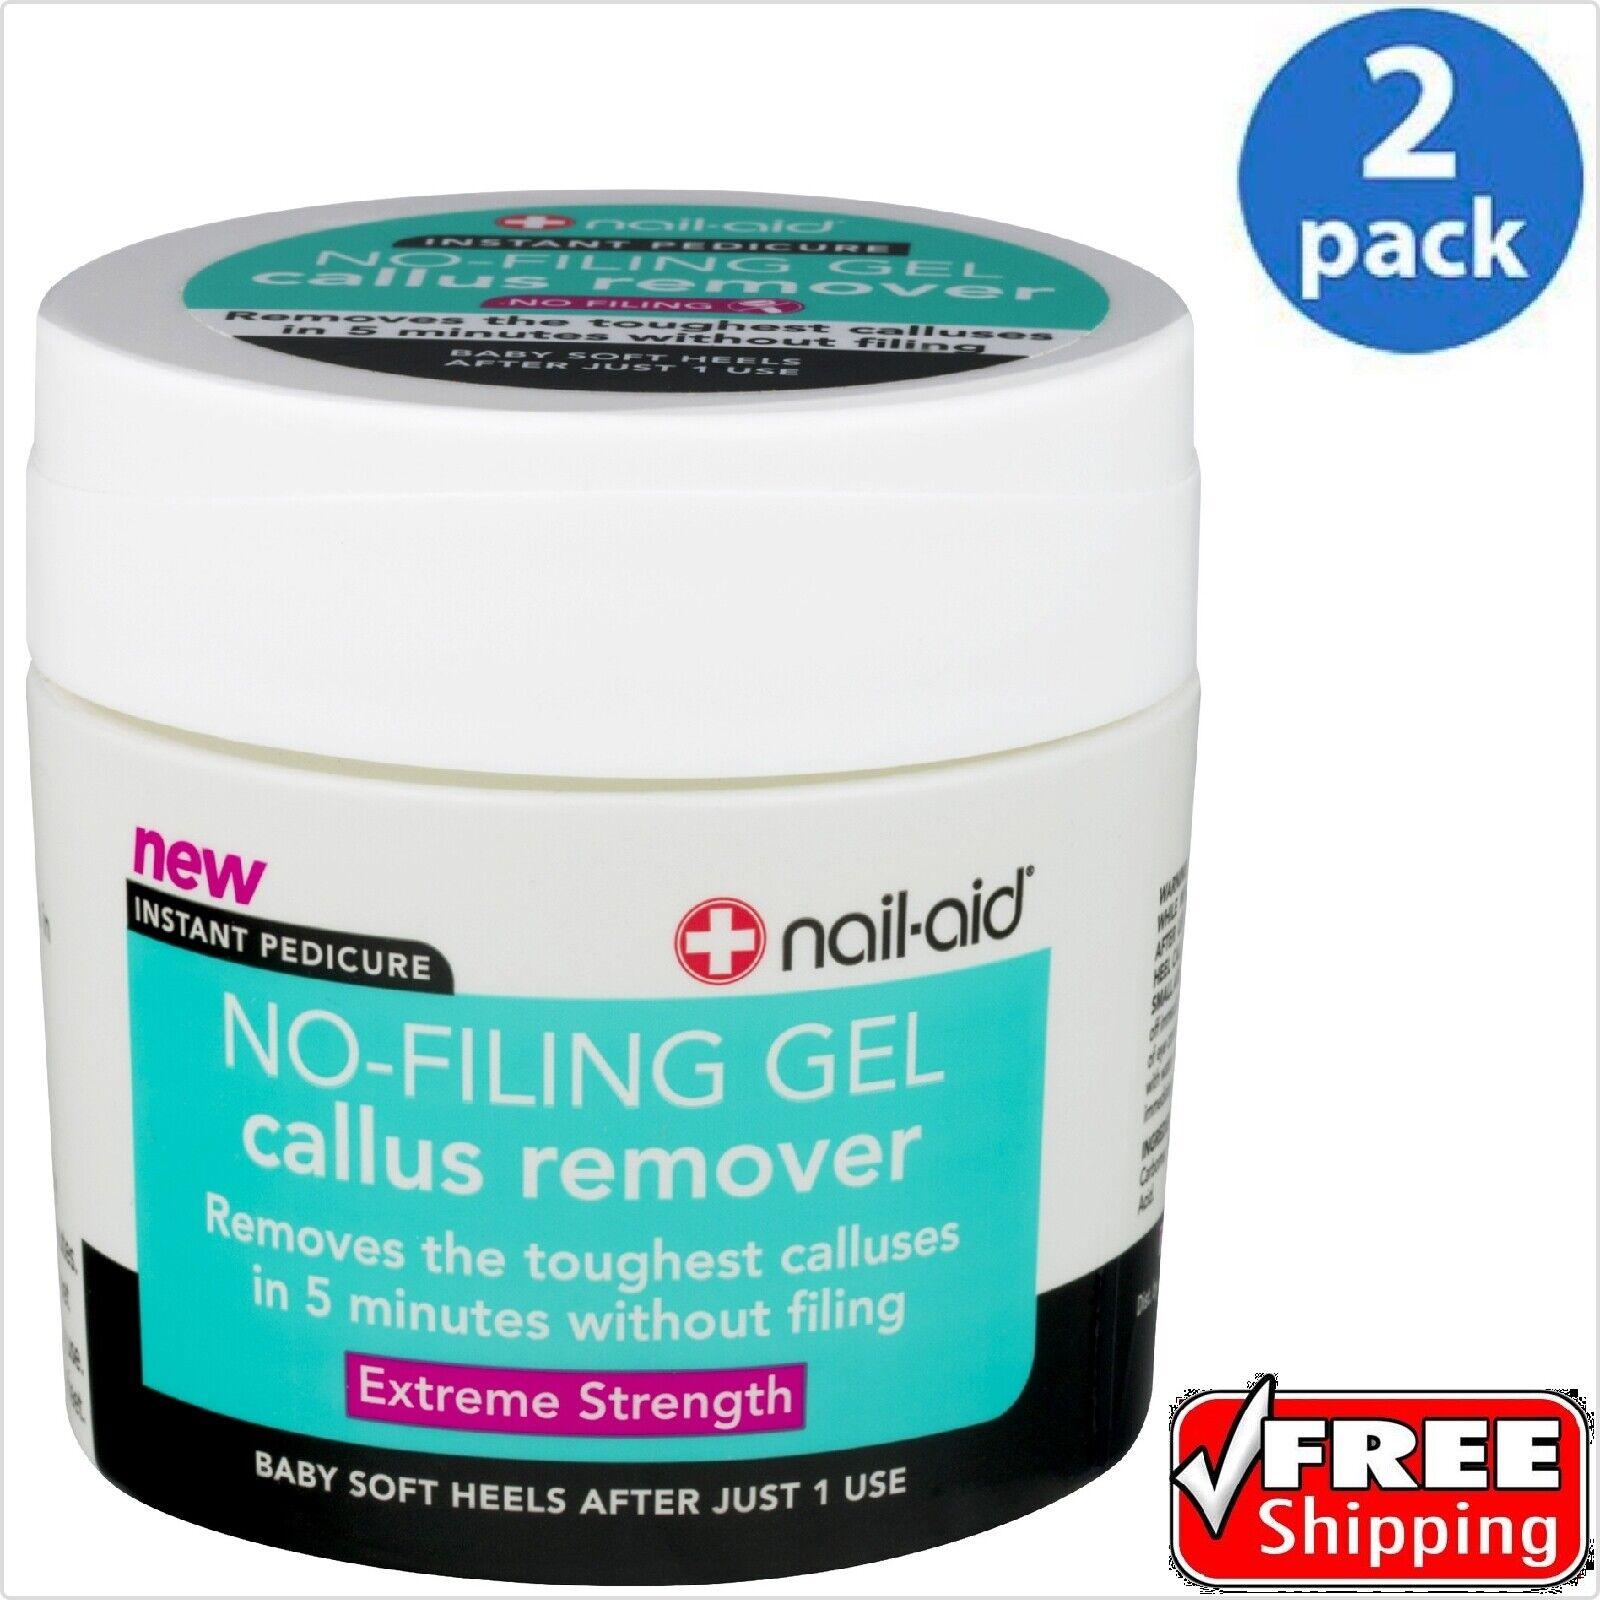 nail-aid ® No-Filing Gel Callus Remover 5.5 OZ - 2 PACK - F